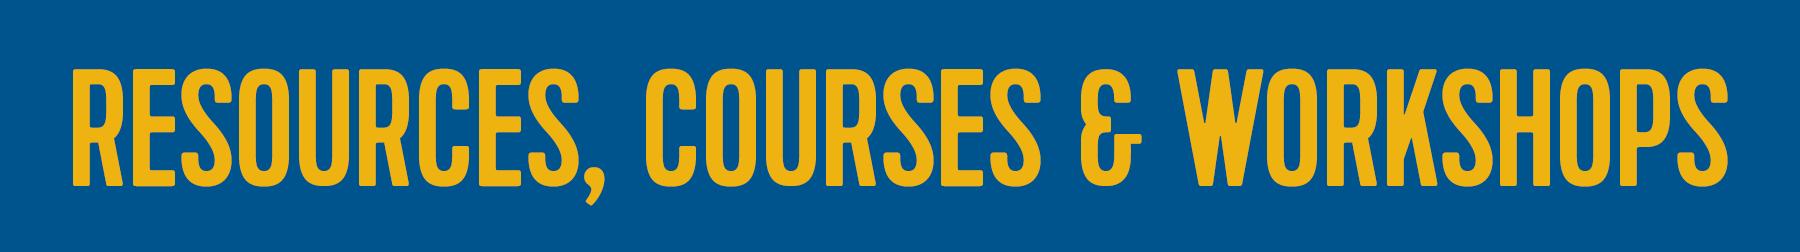 Resources Courses Workshops